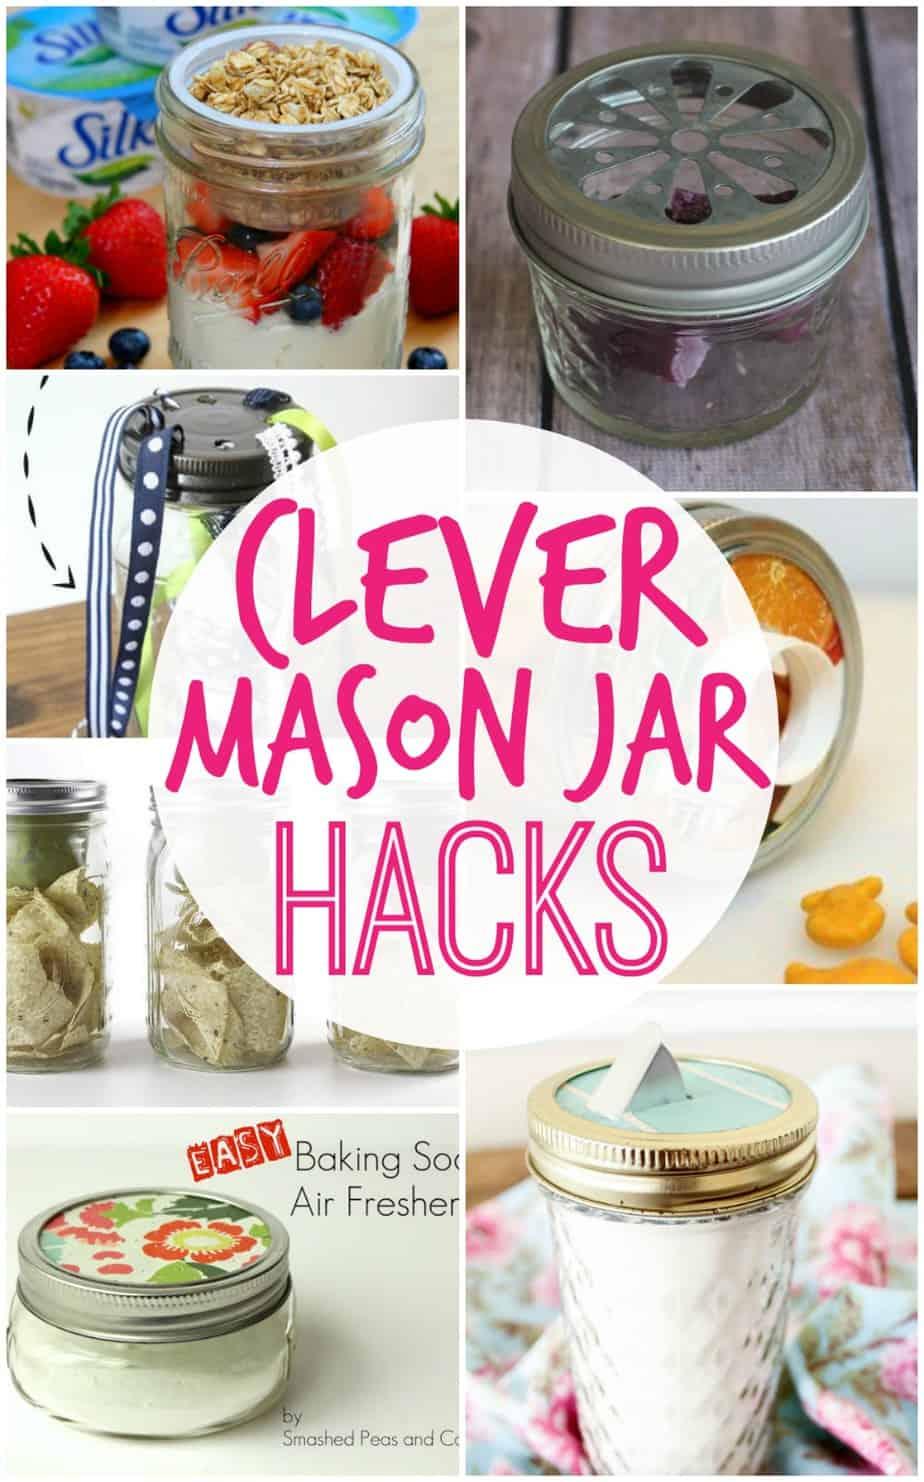 Clever Mason Jar Hacks